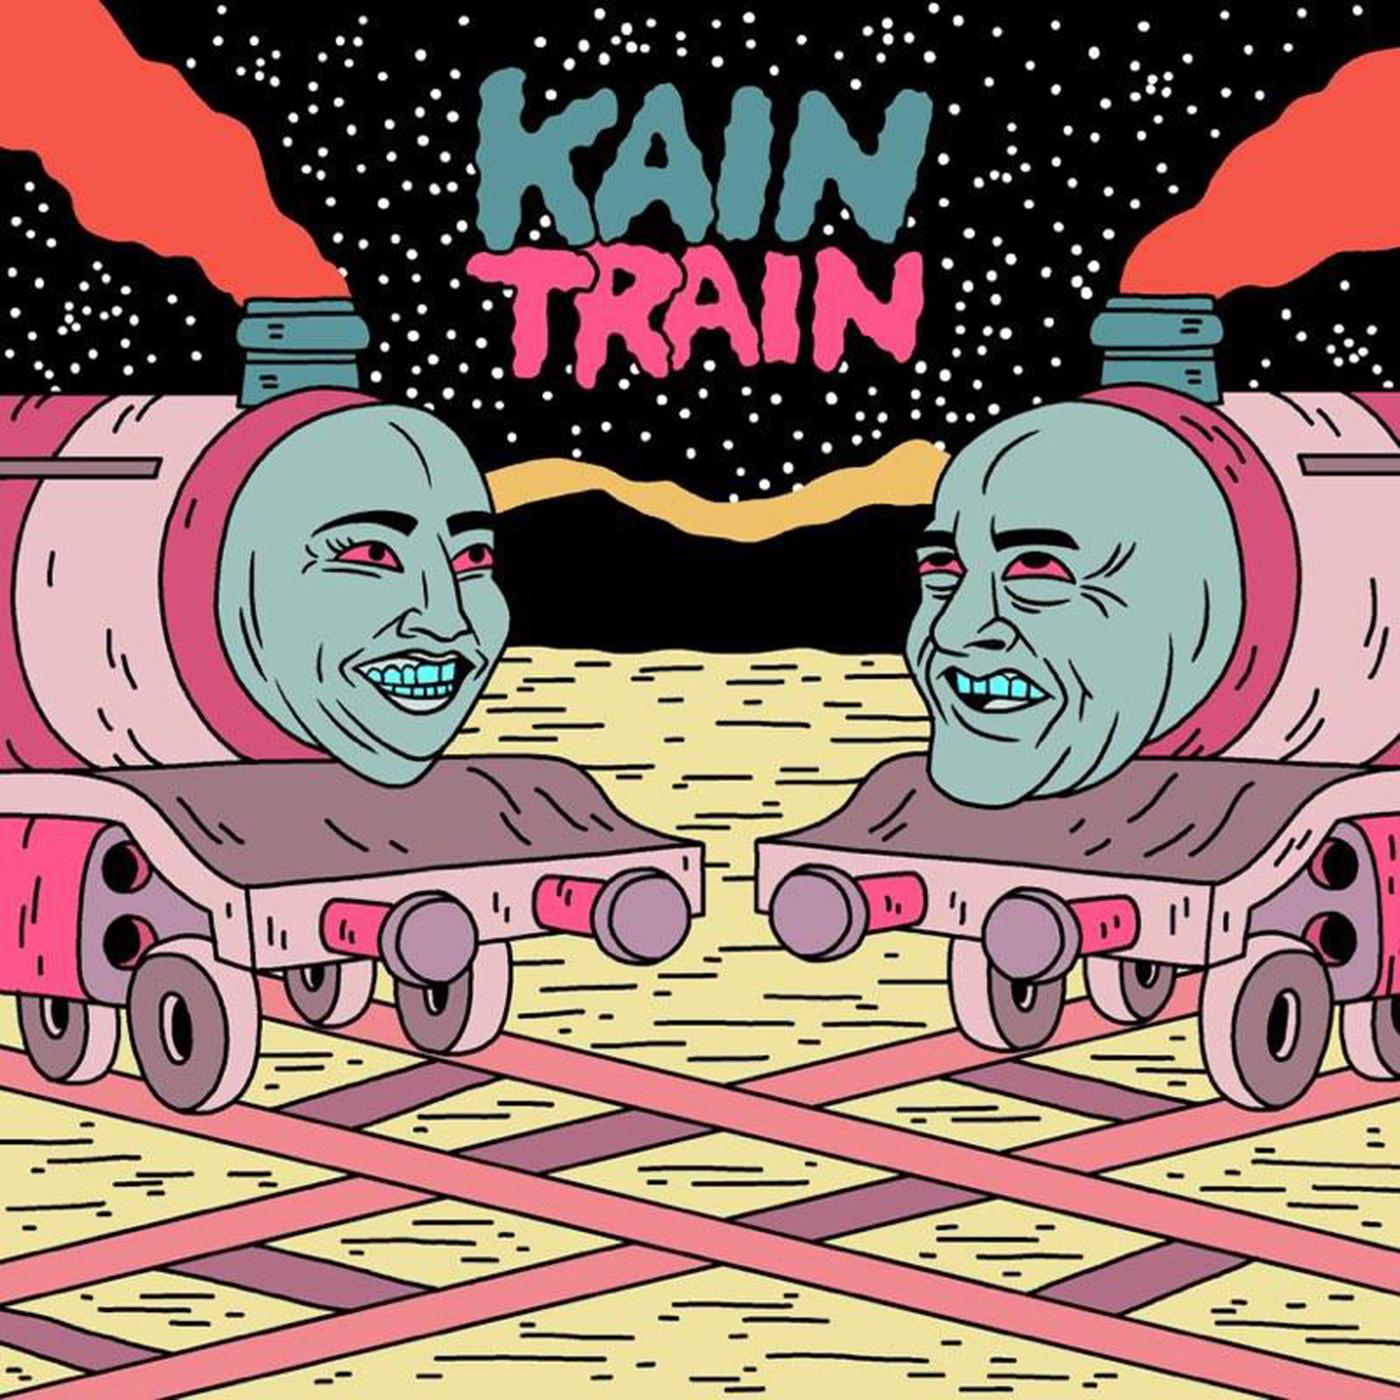 Kain Train